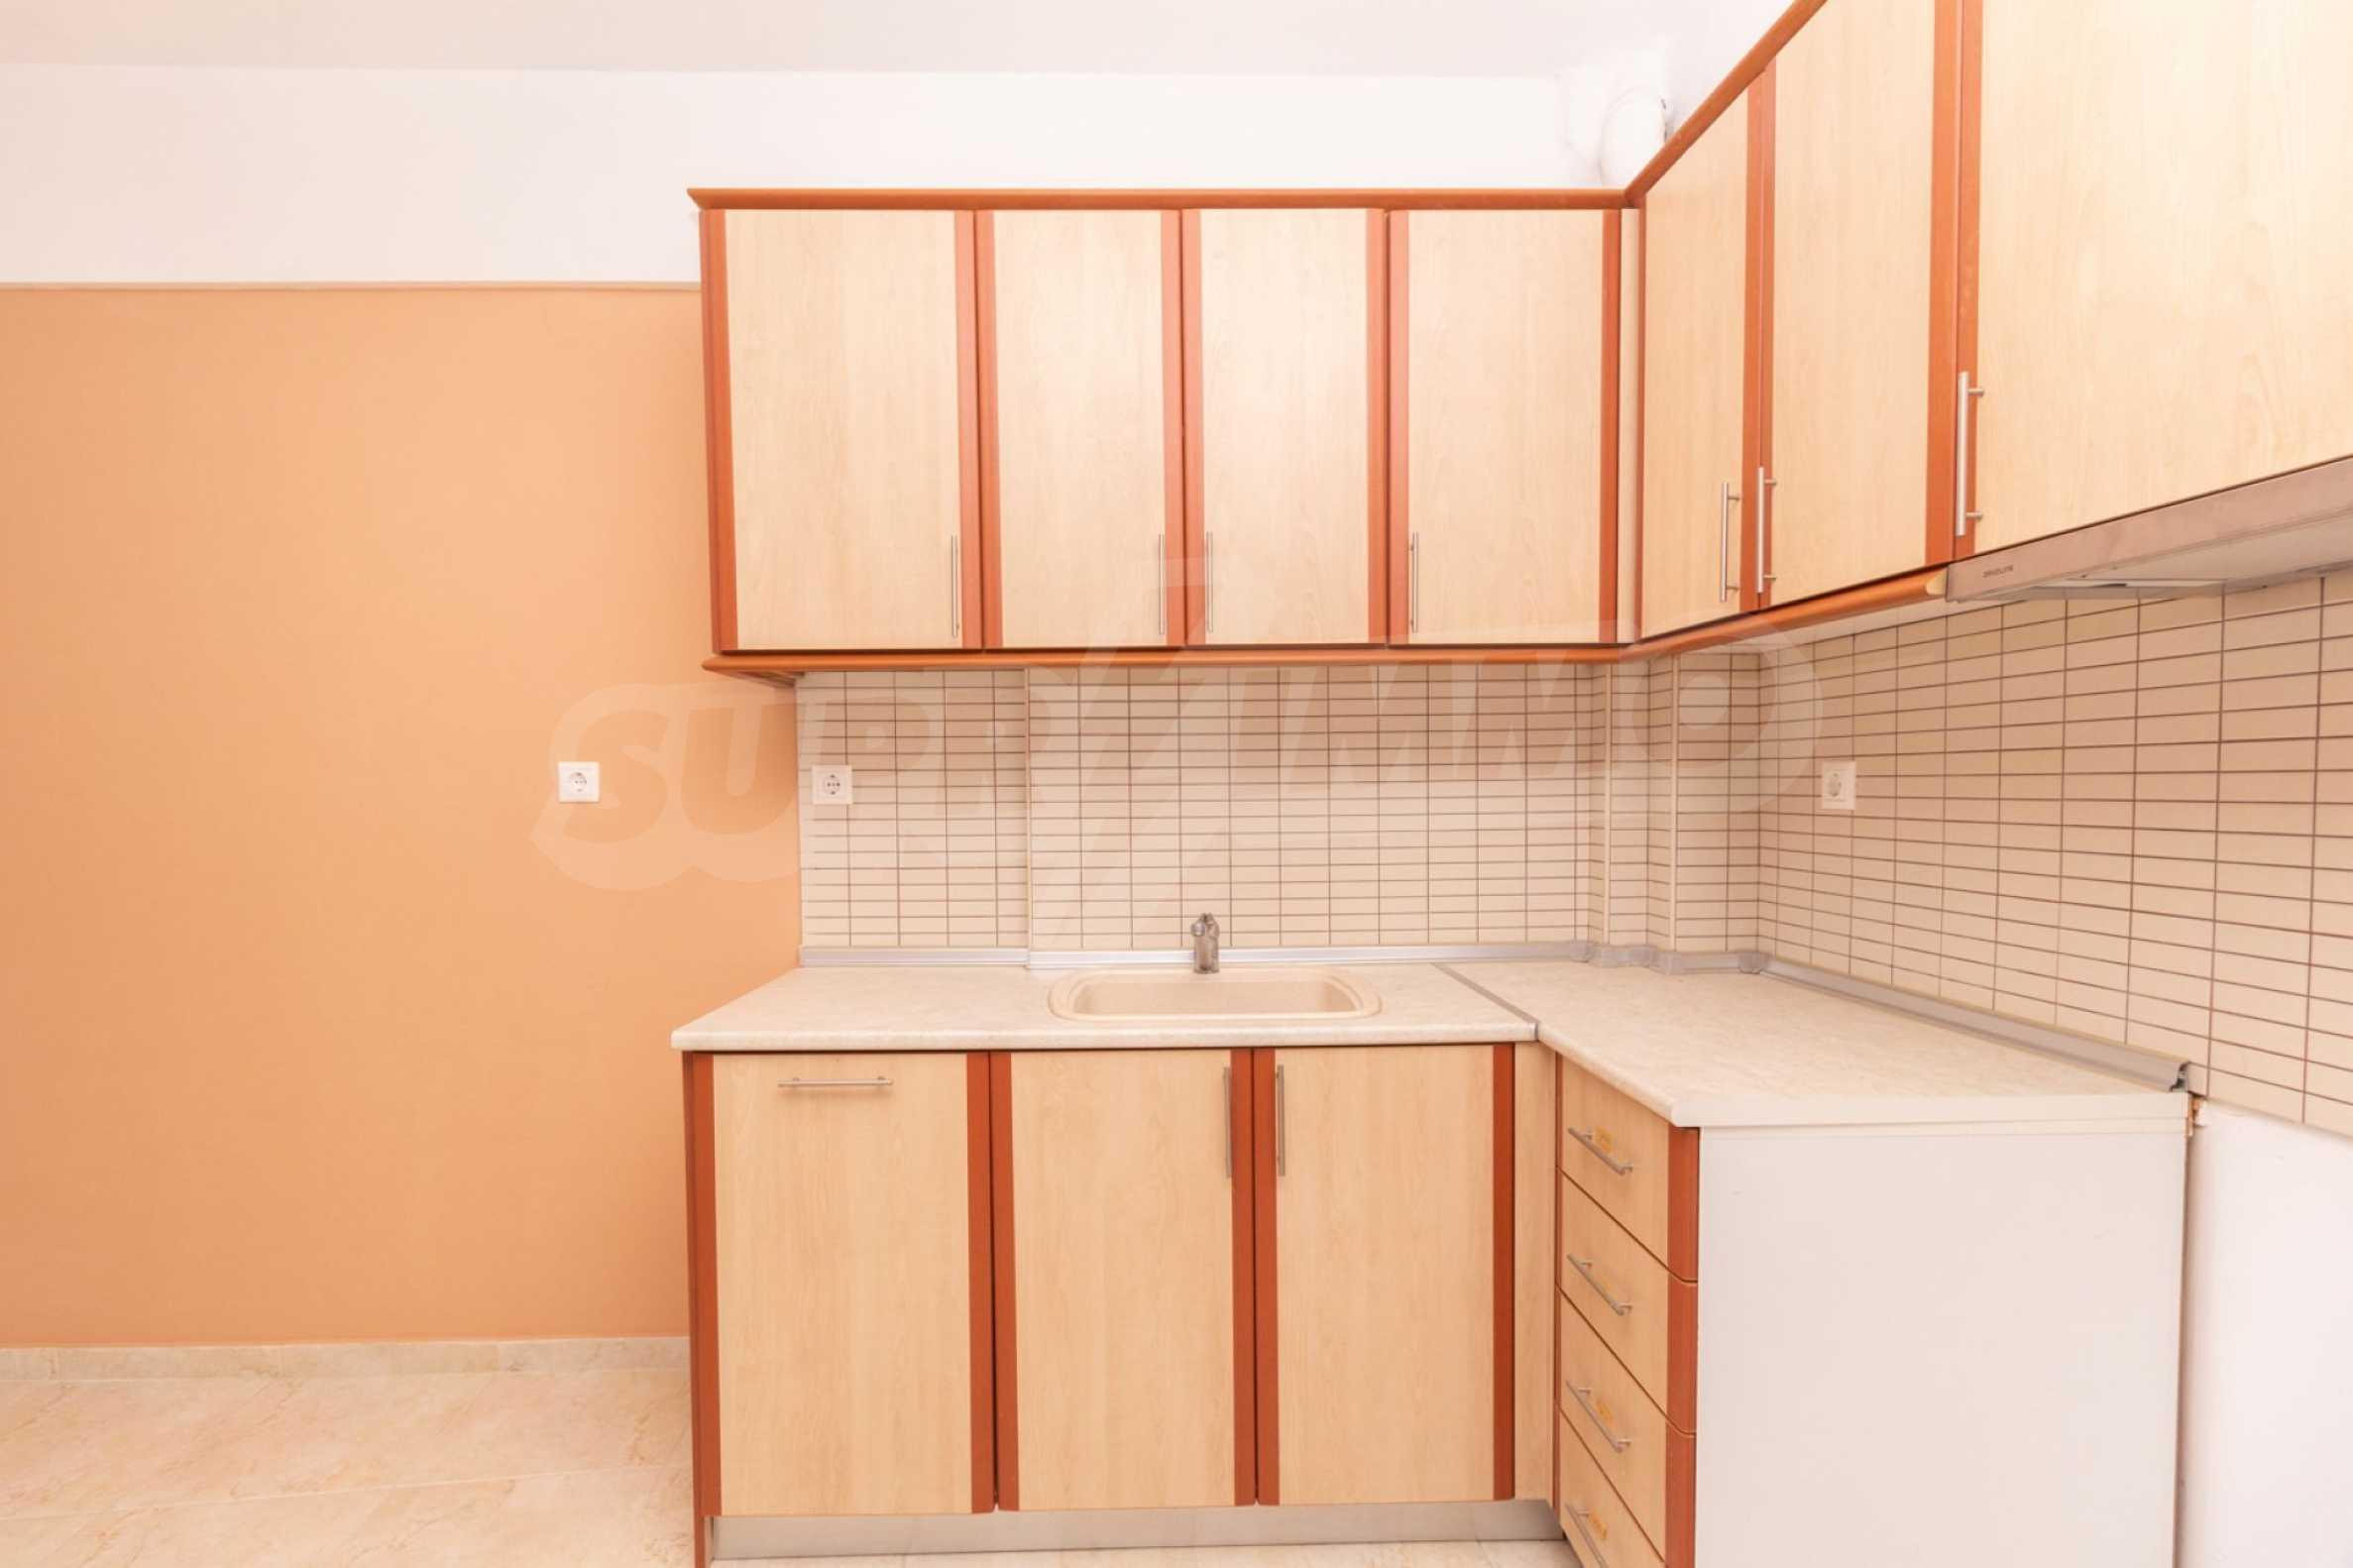 тристаен апартамент в Потидея, Касандра 24